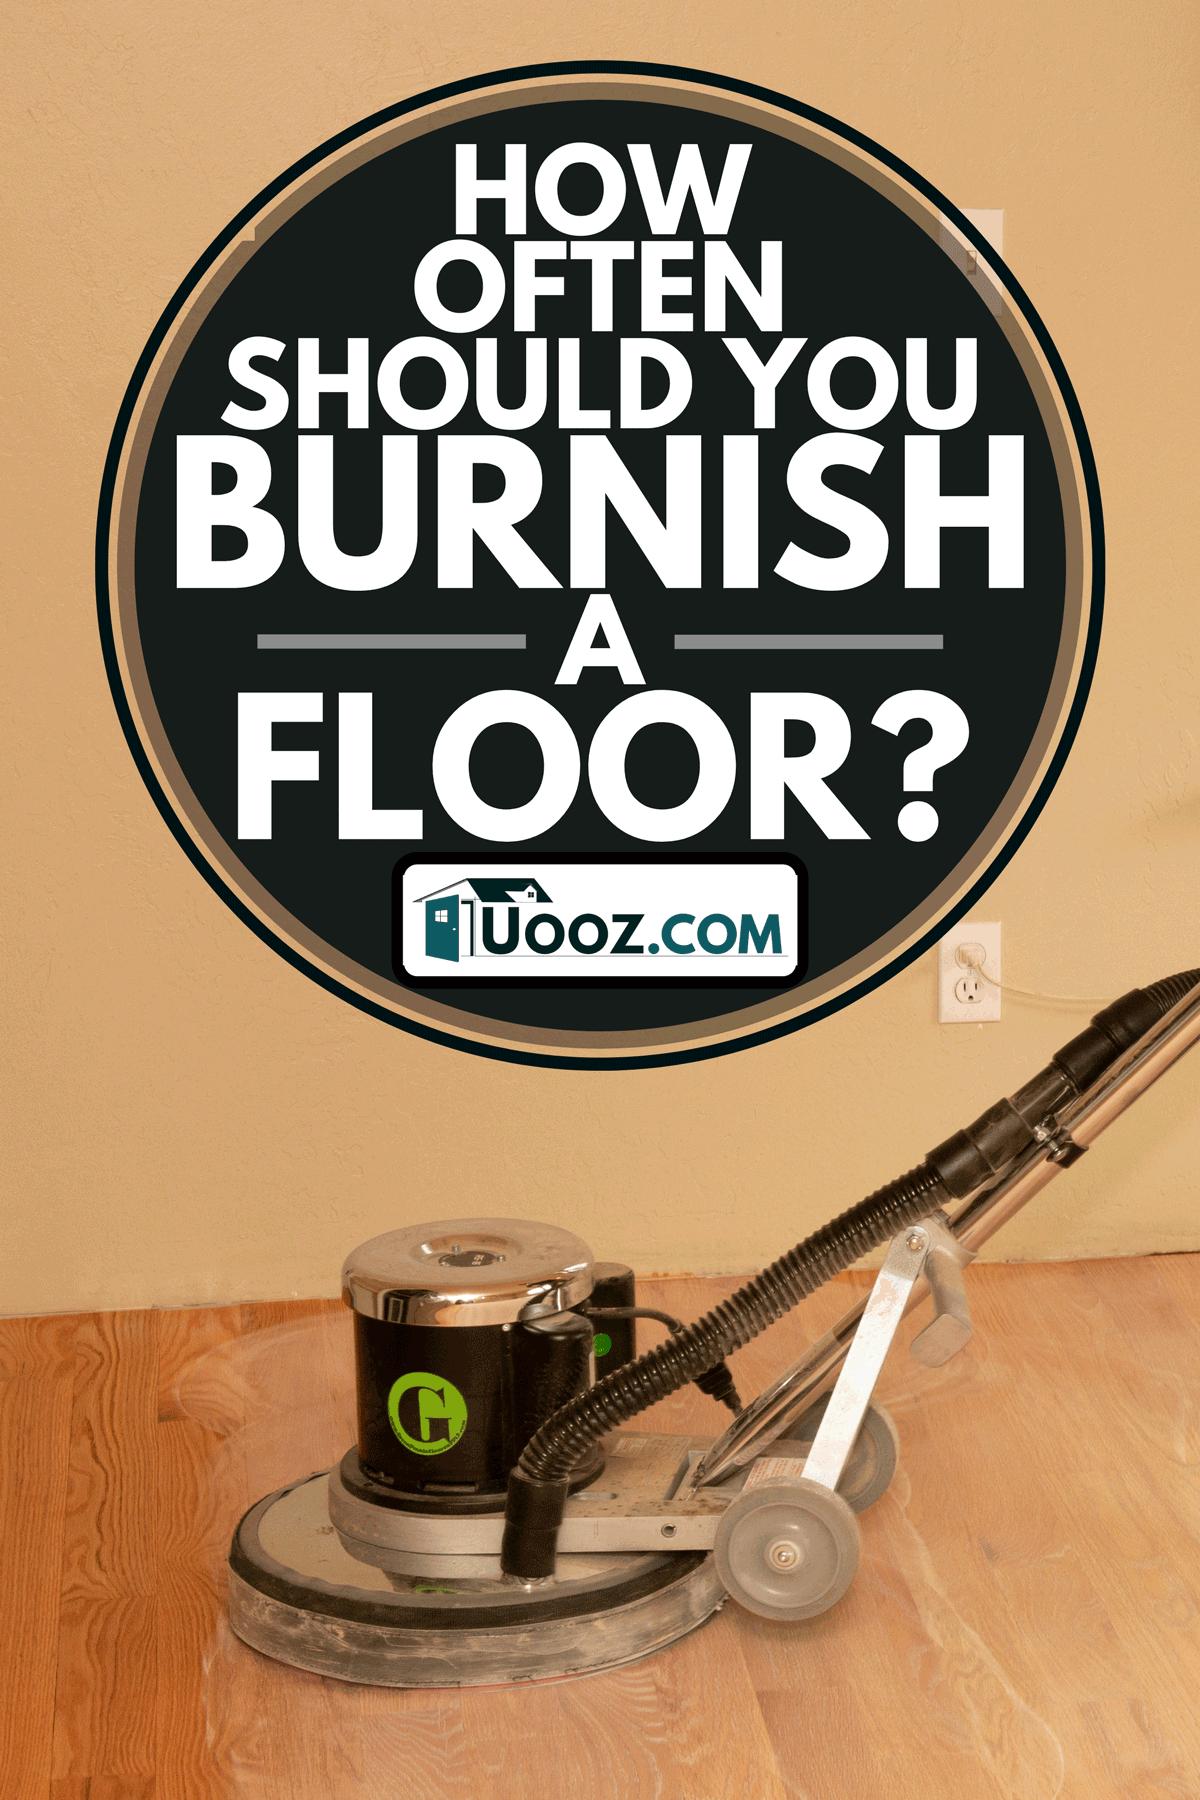 A professional installation of solid oak hardwood floor, How Often Should You Burnish A Floor?